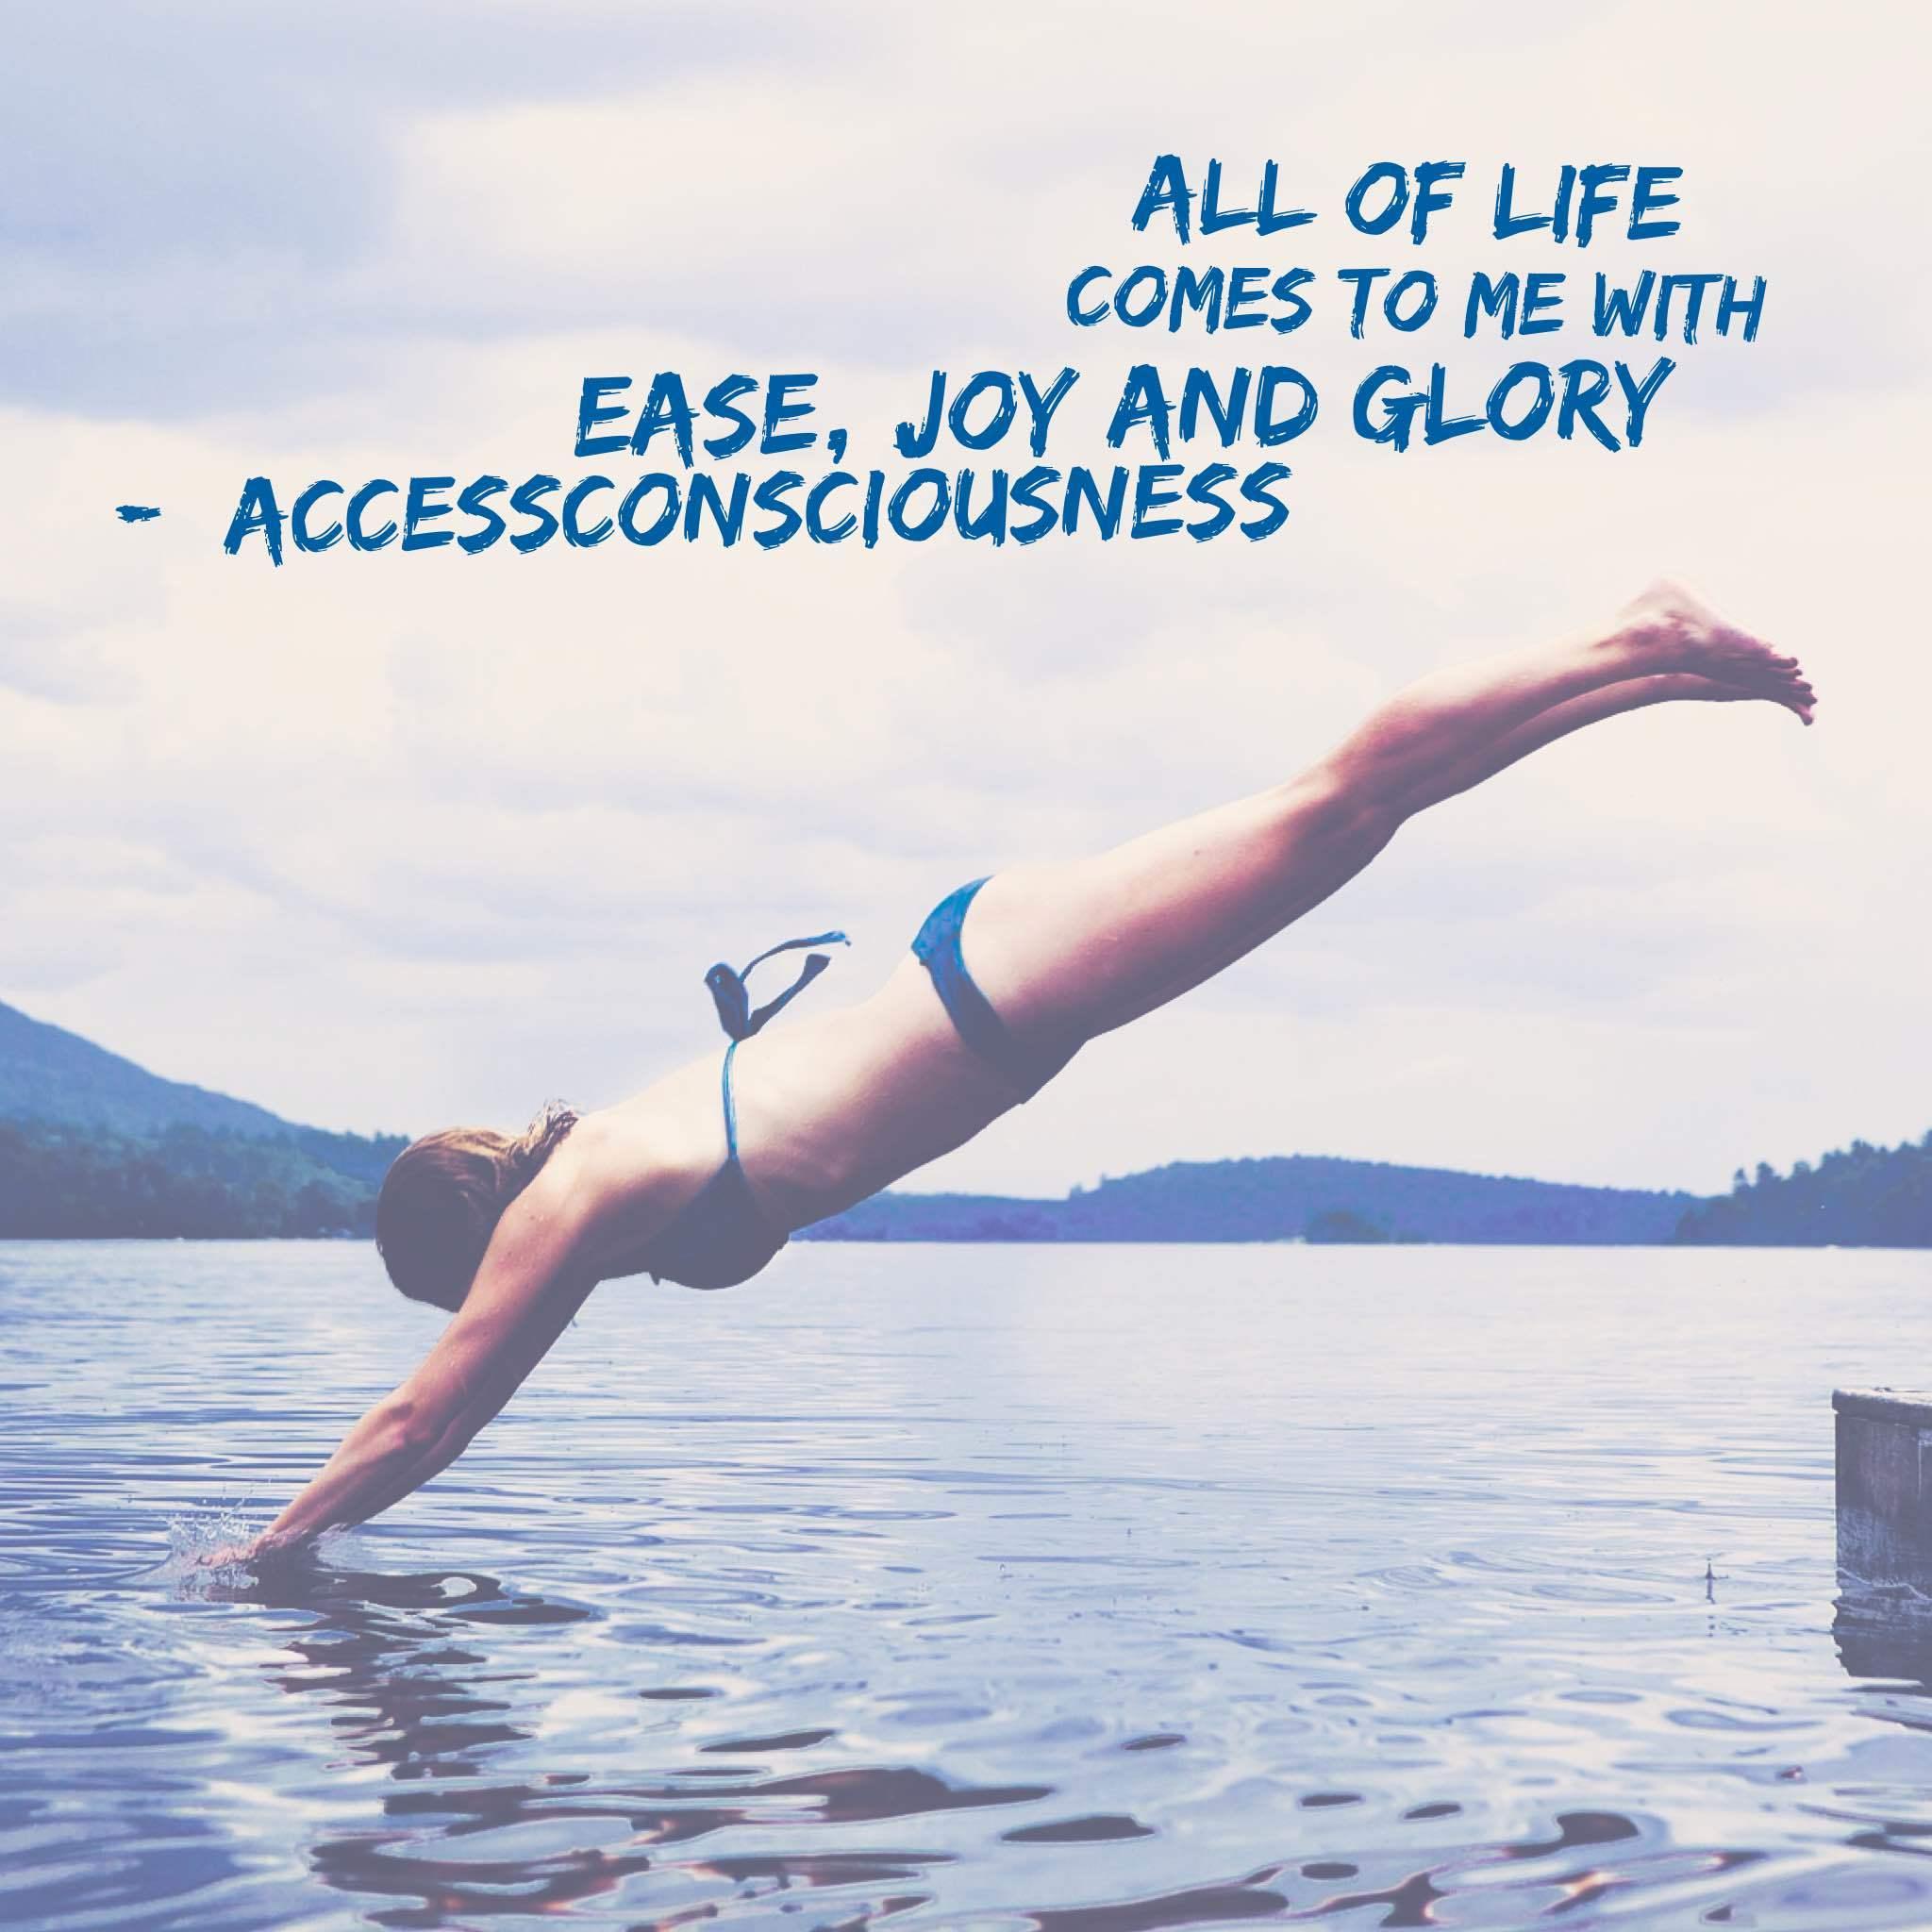 Ease joy and glory